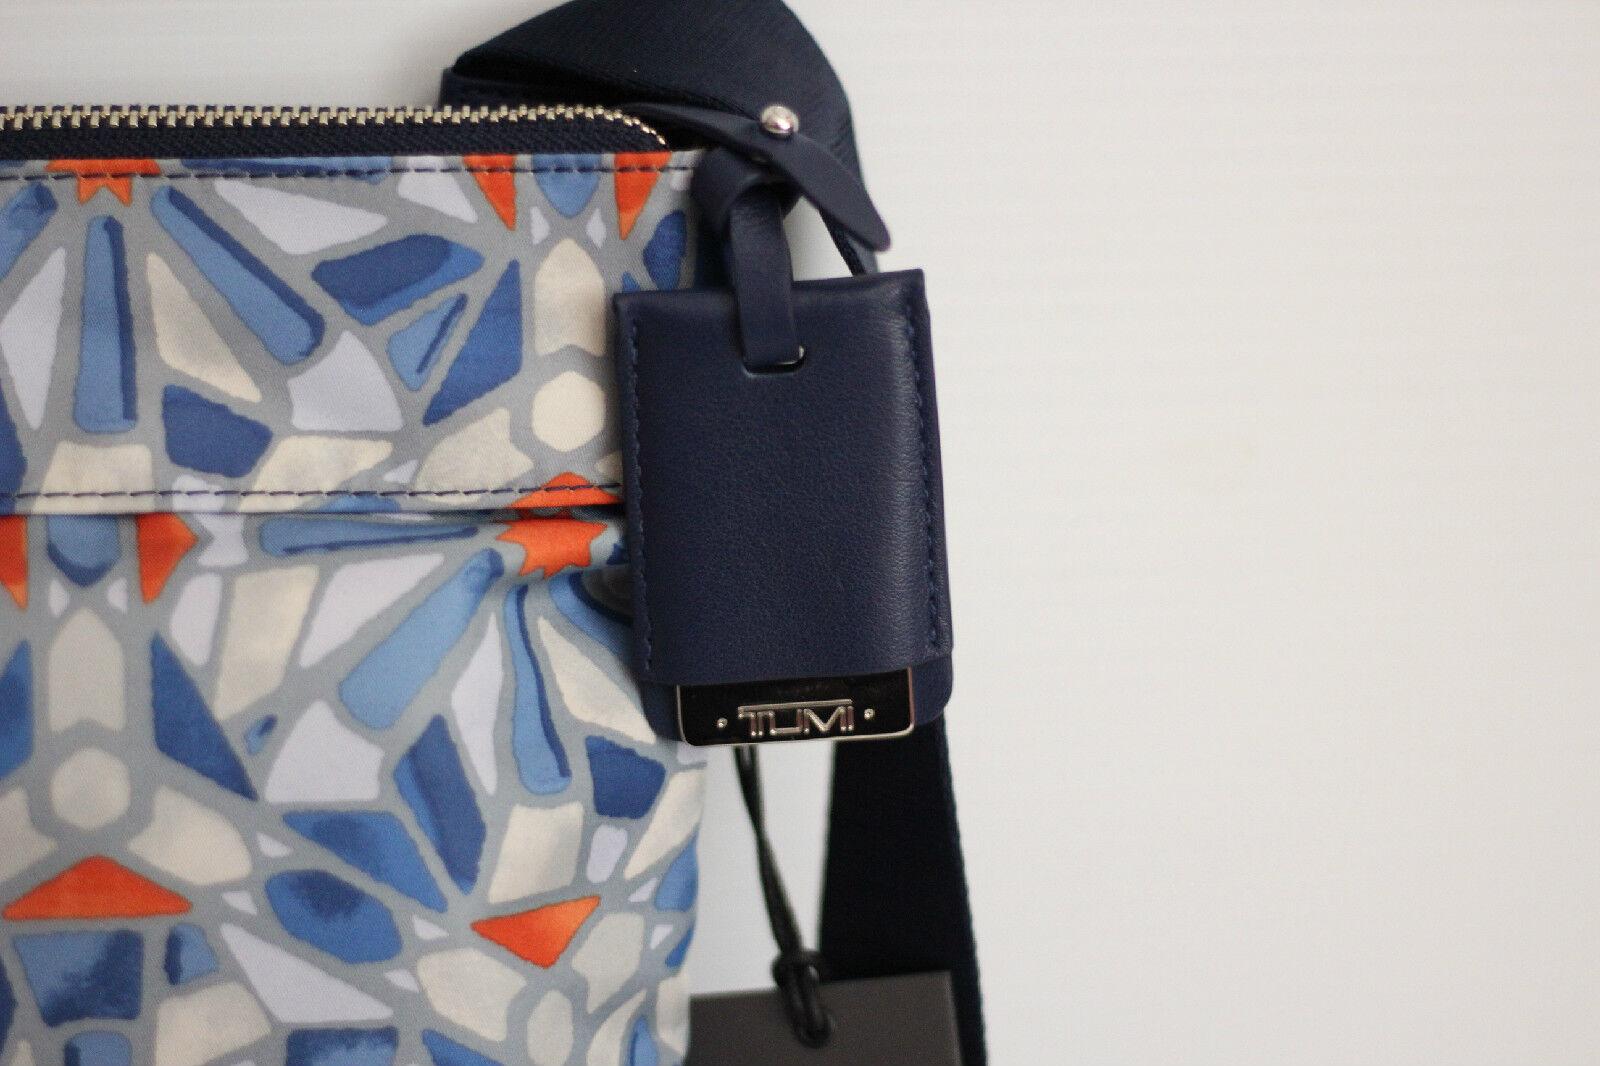 New Tumi Voyageur 'Calera' Crossbody Messenger Bag - Blue Cayenne Tile Print